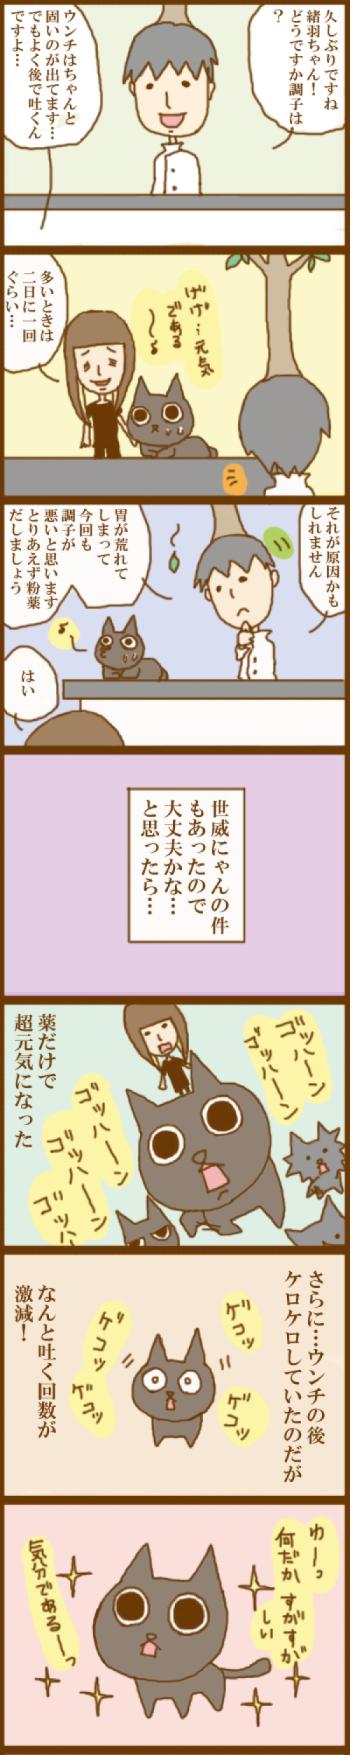 f:id:suzuokayu:20201123092533j:plain